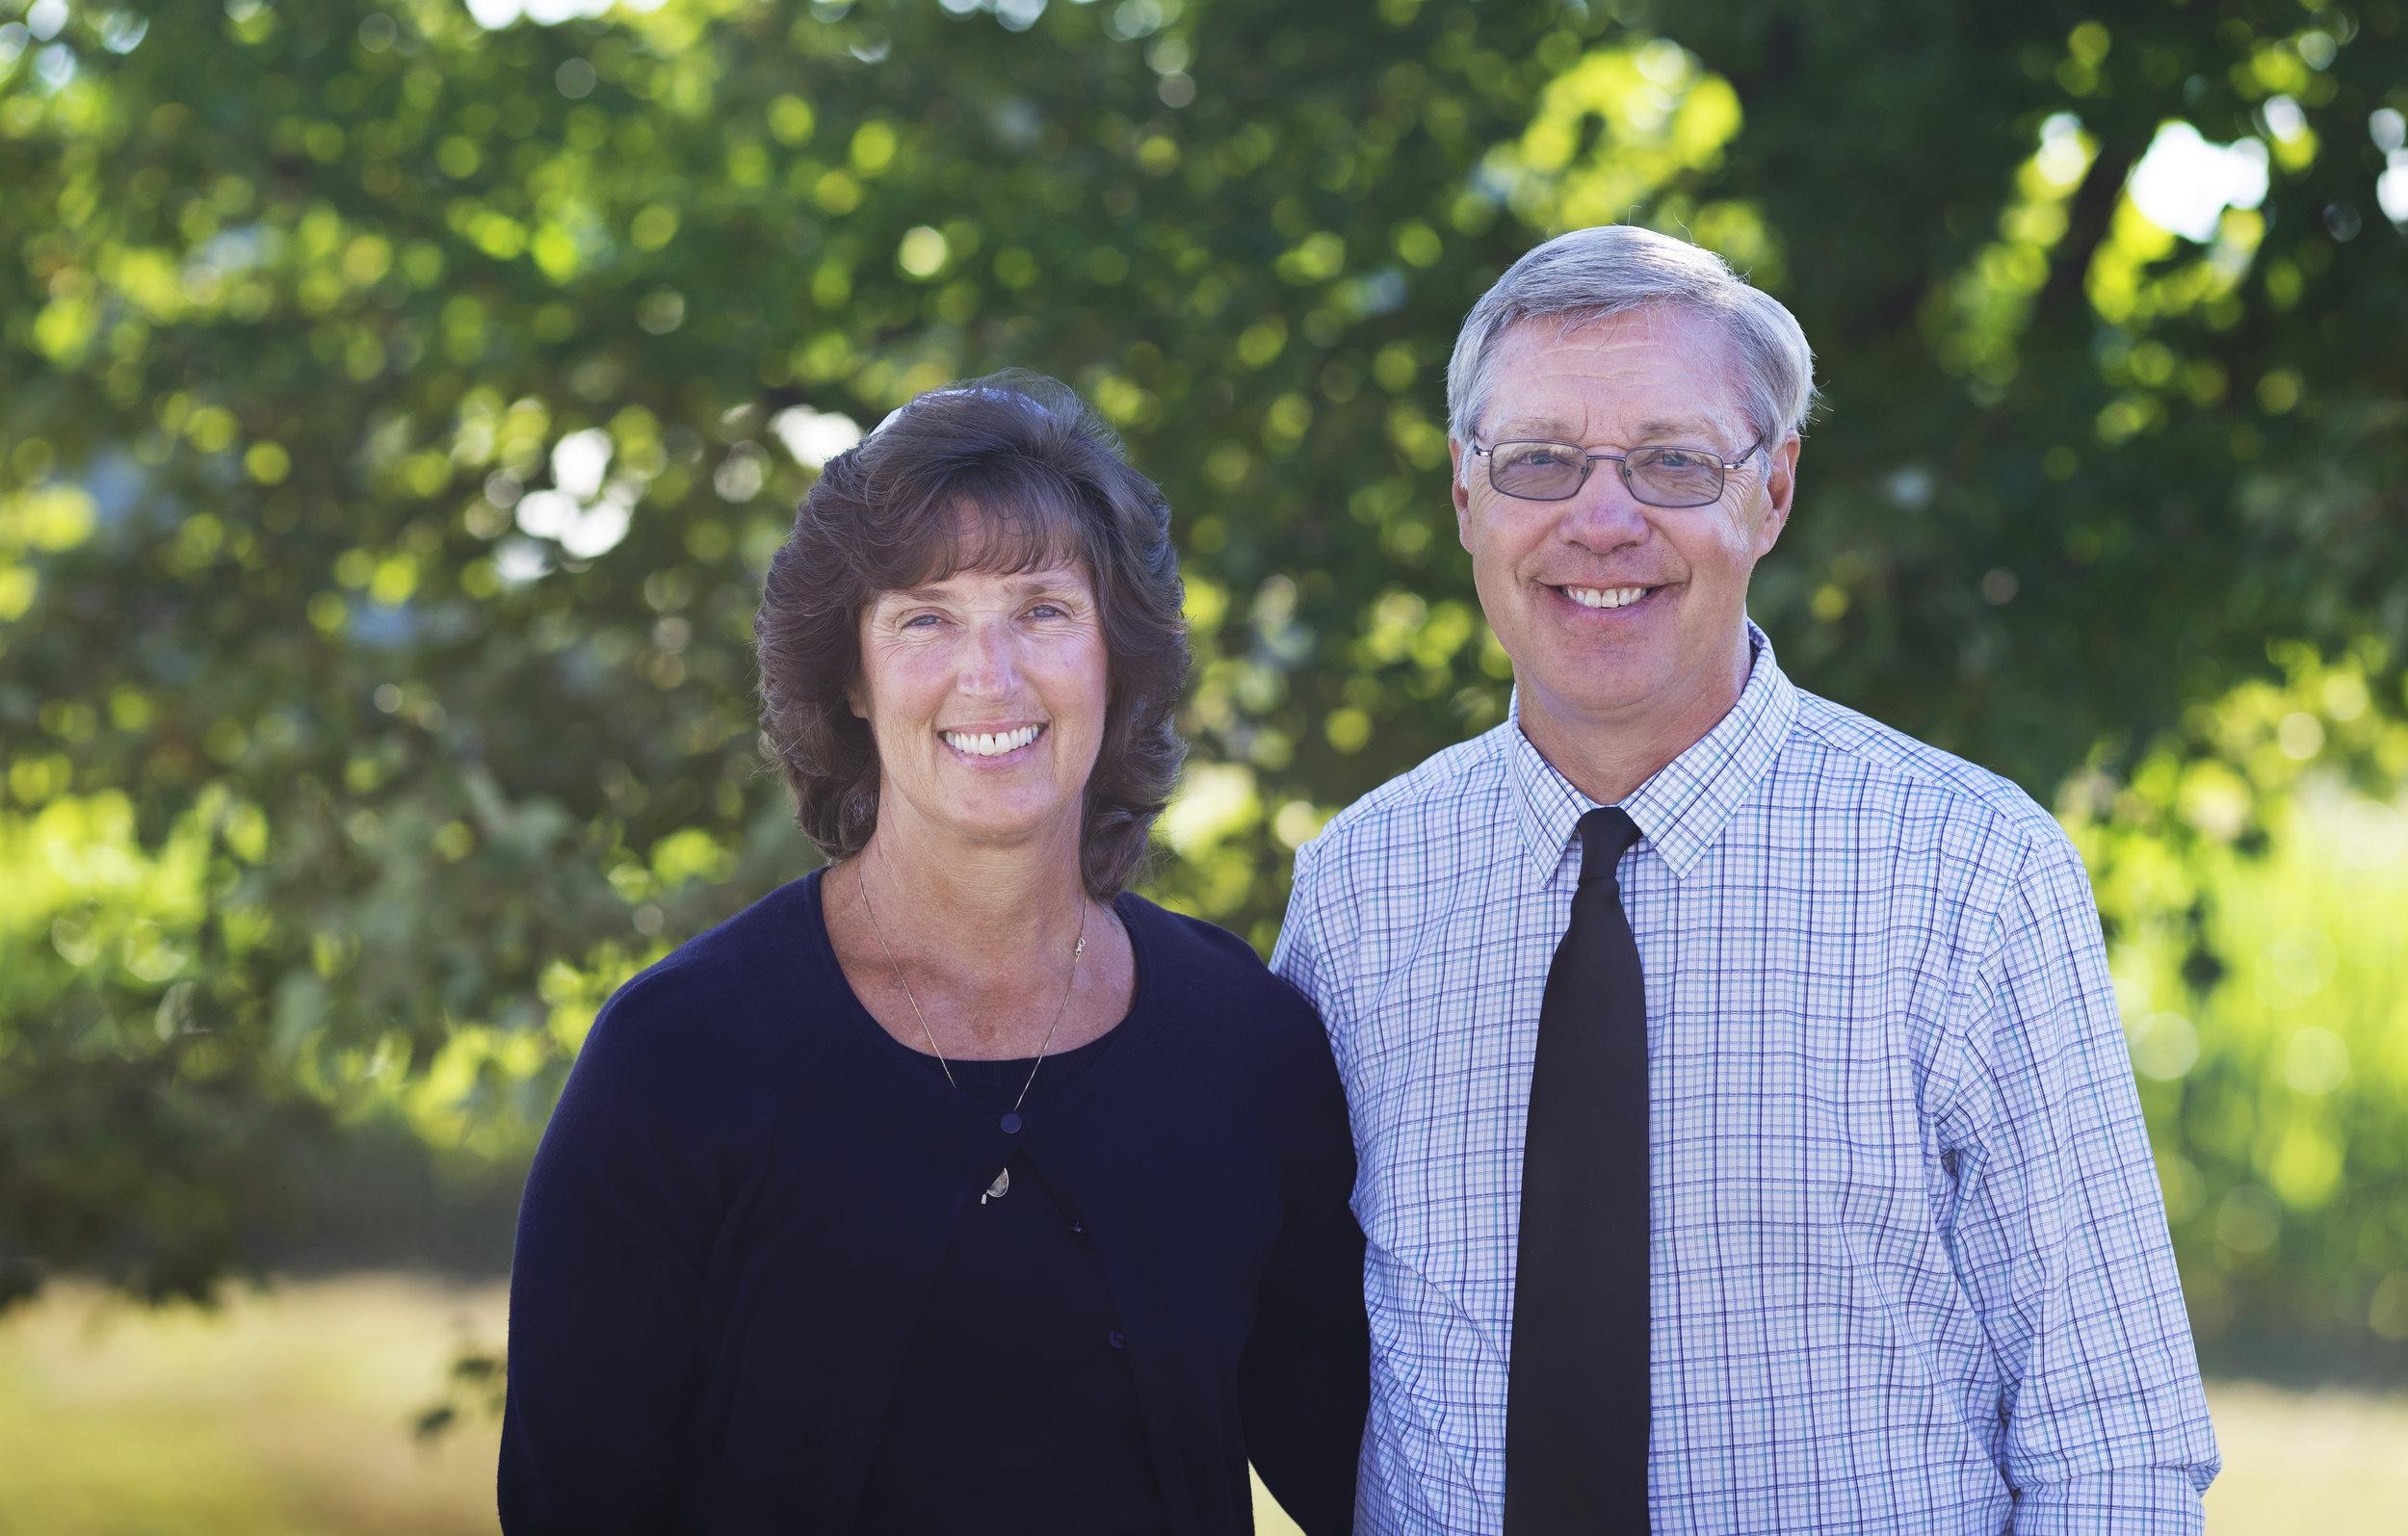 Wayne and Deb Hartman